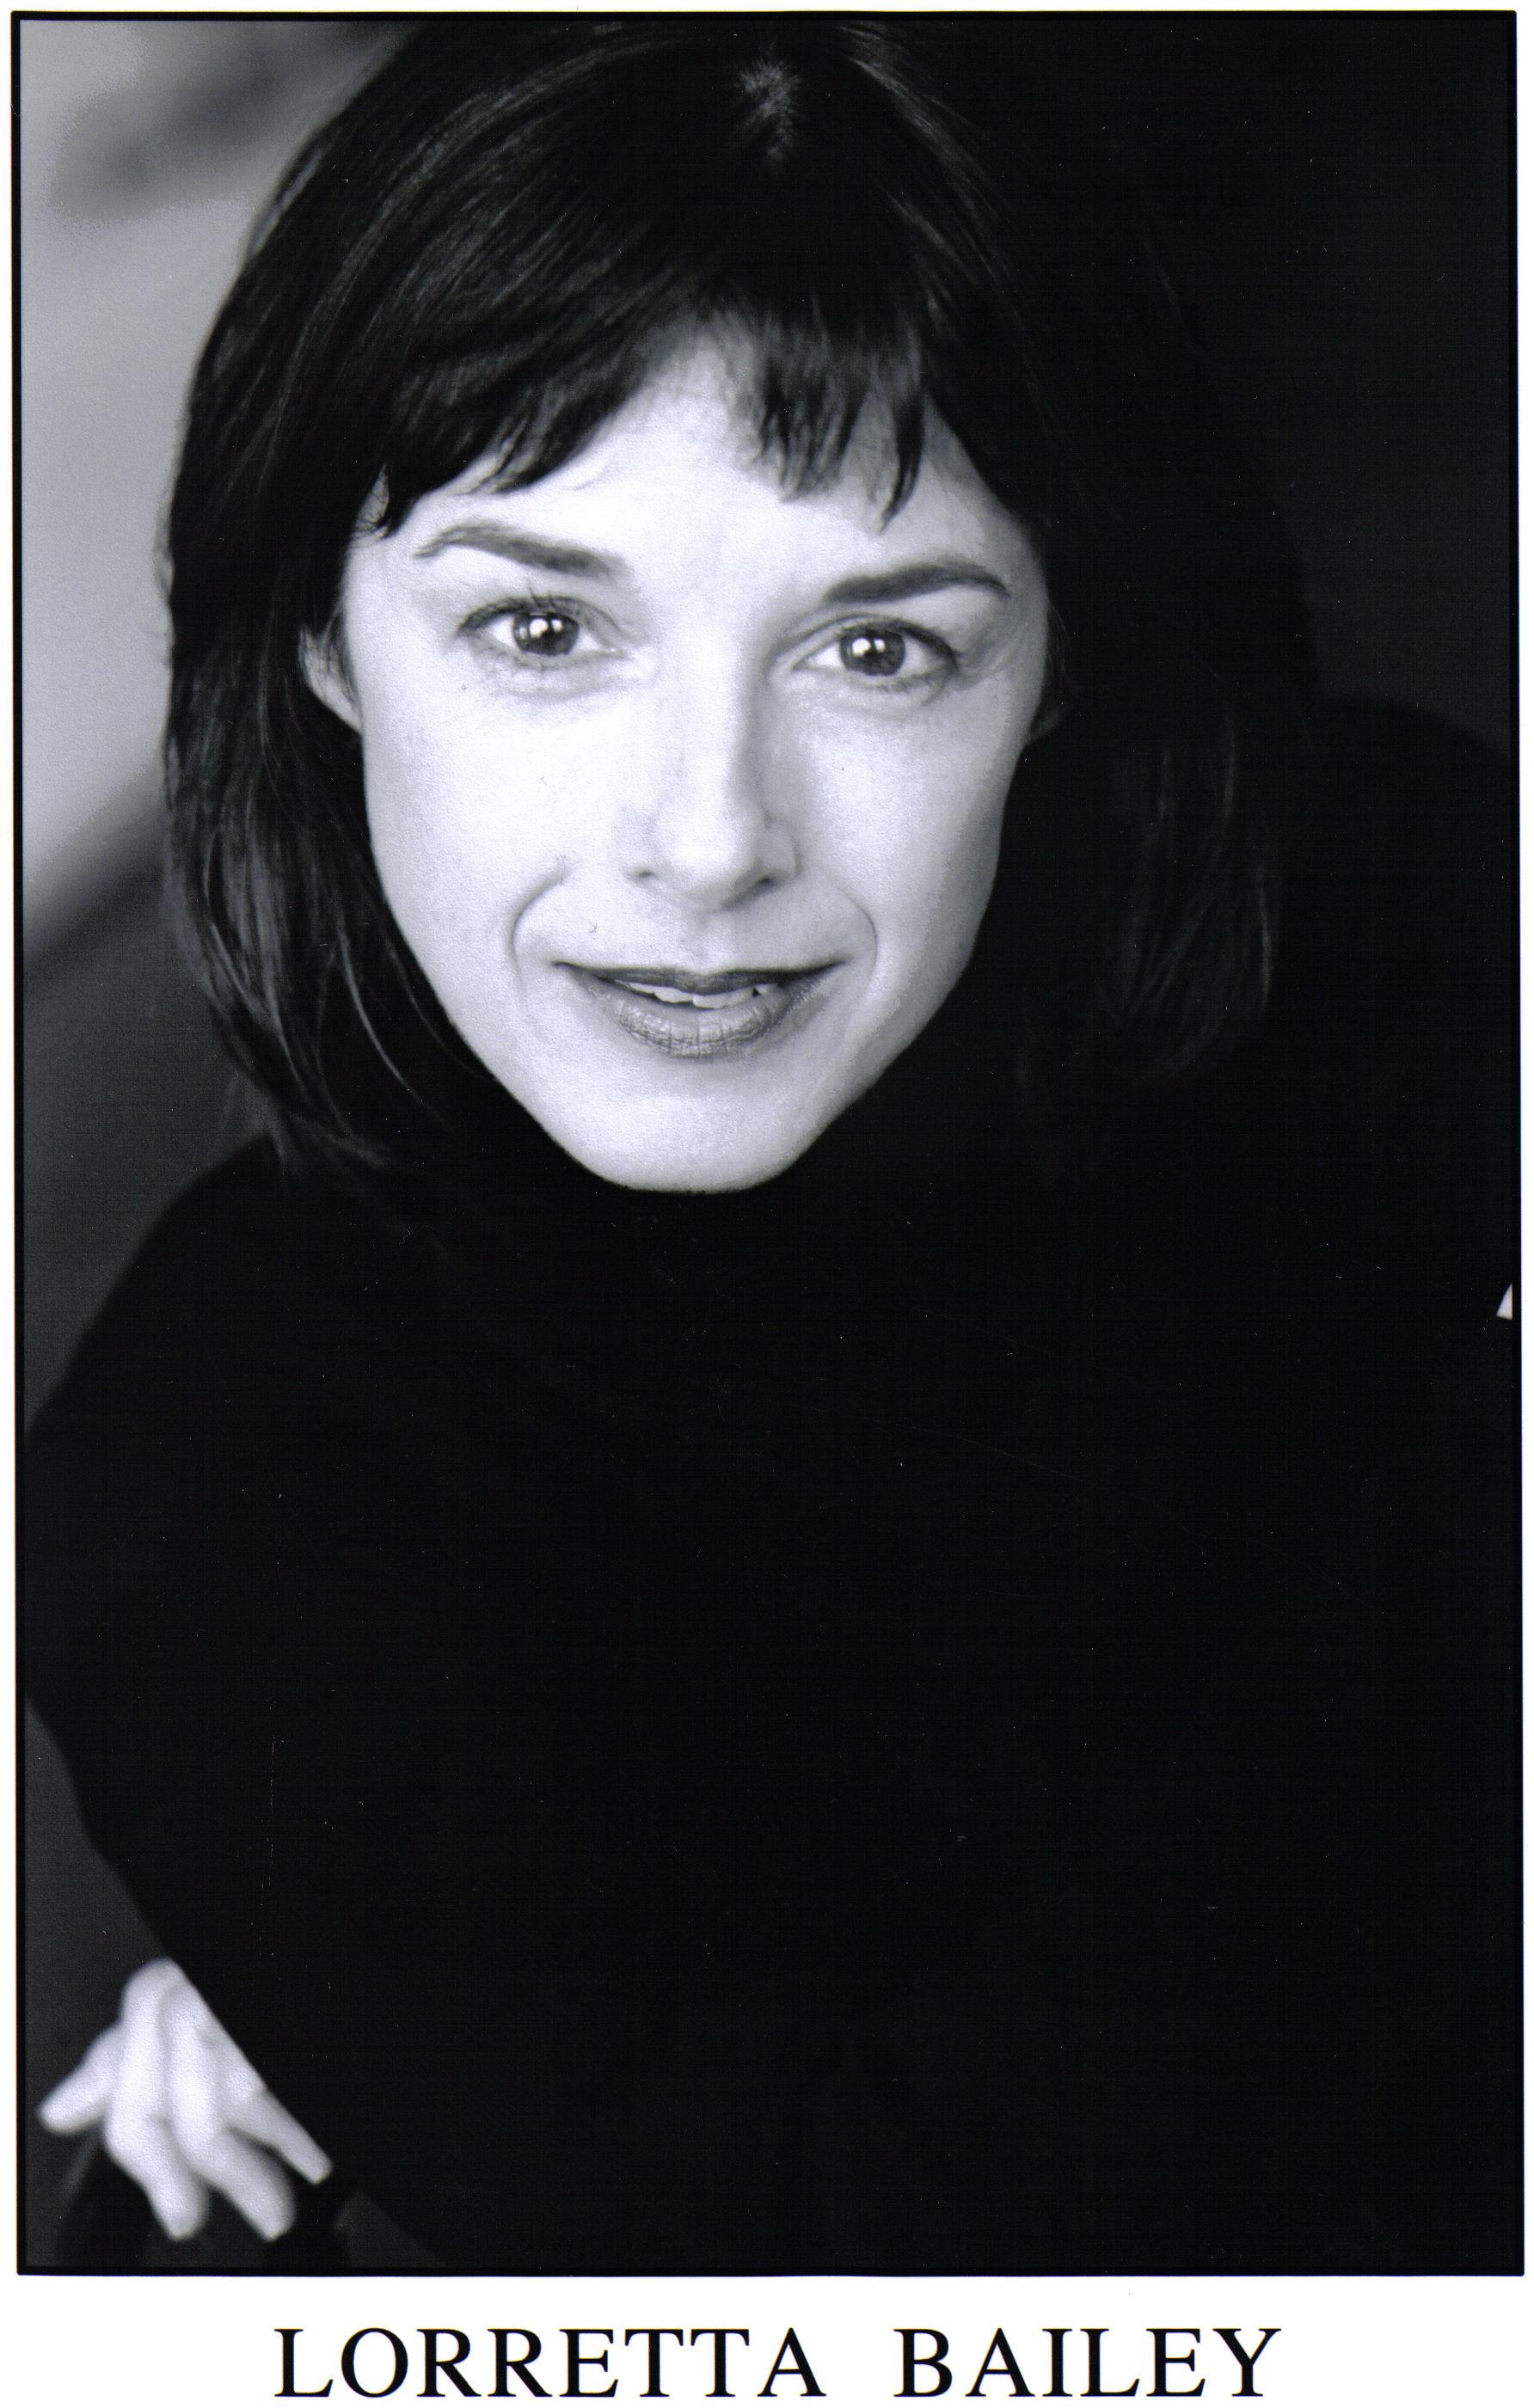 LORETTA BAILEY